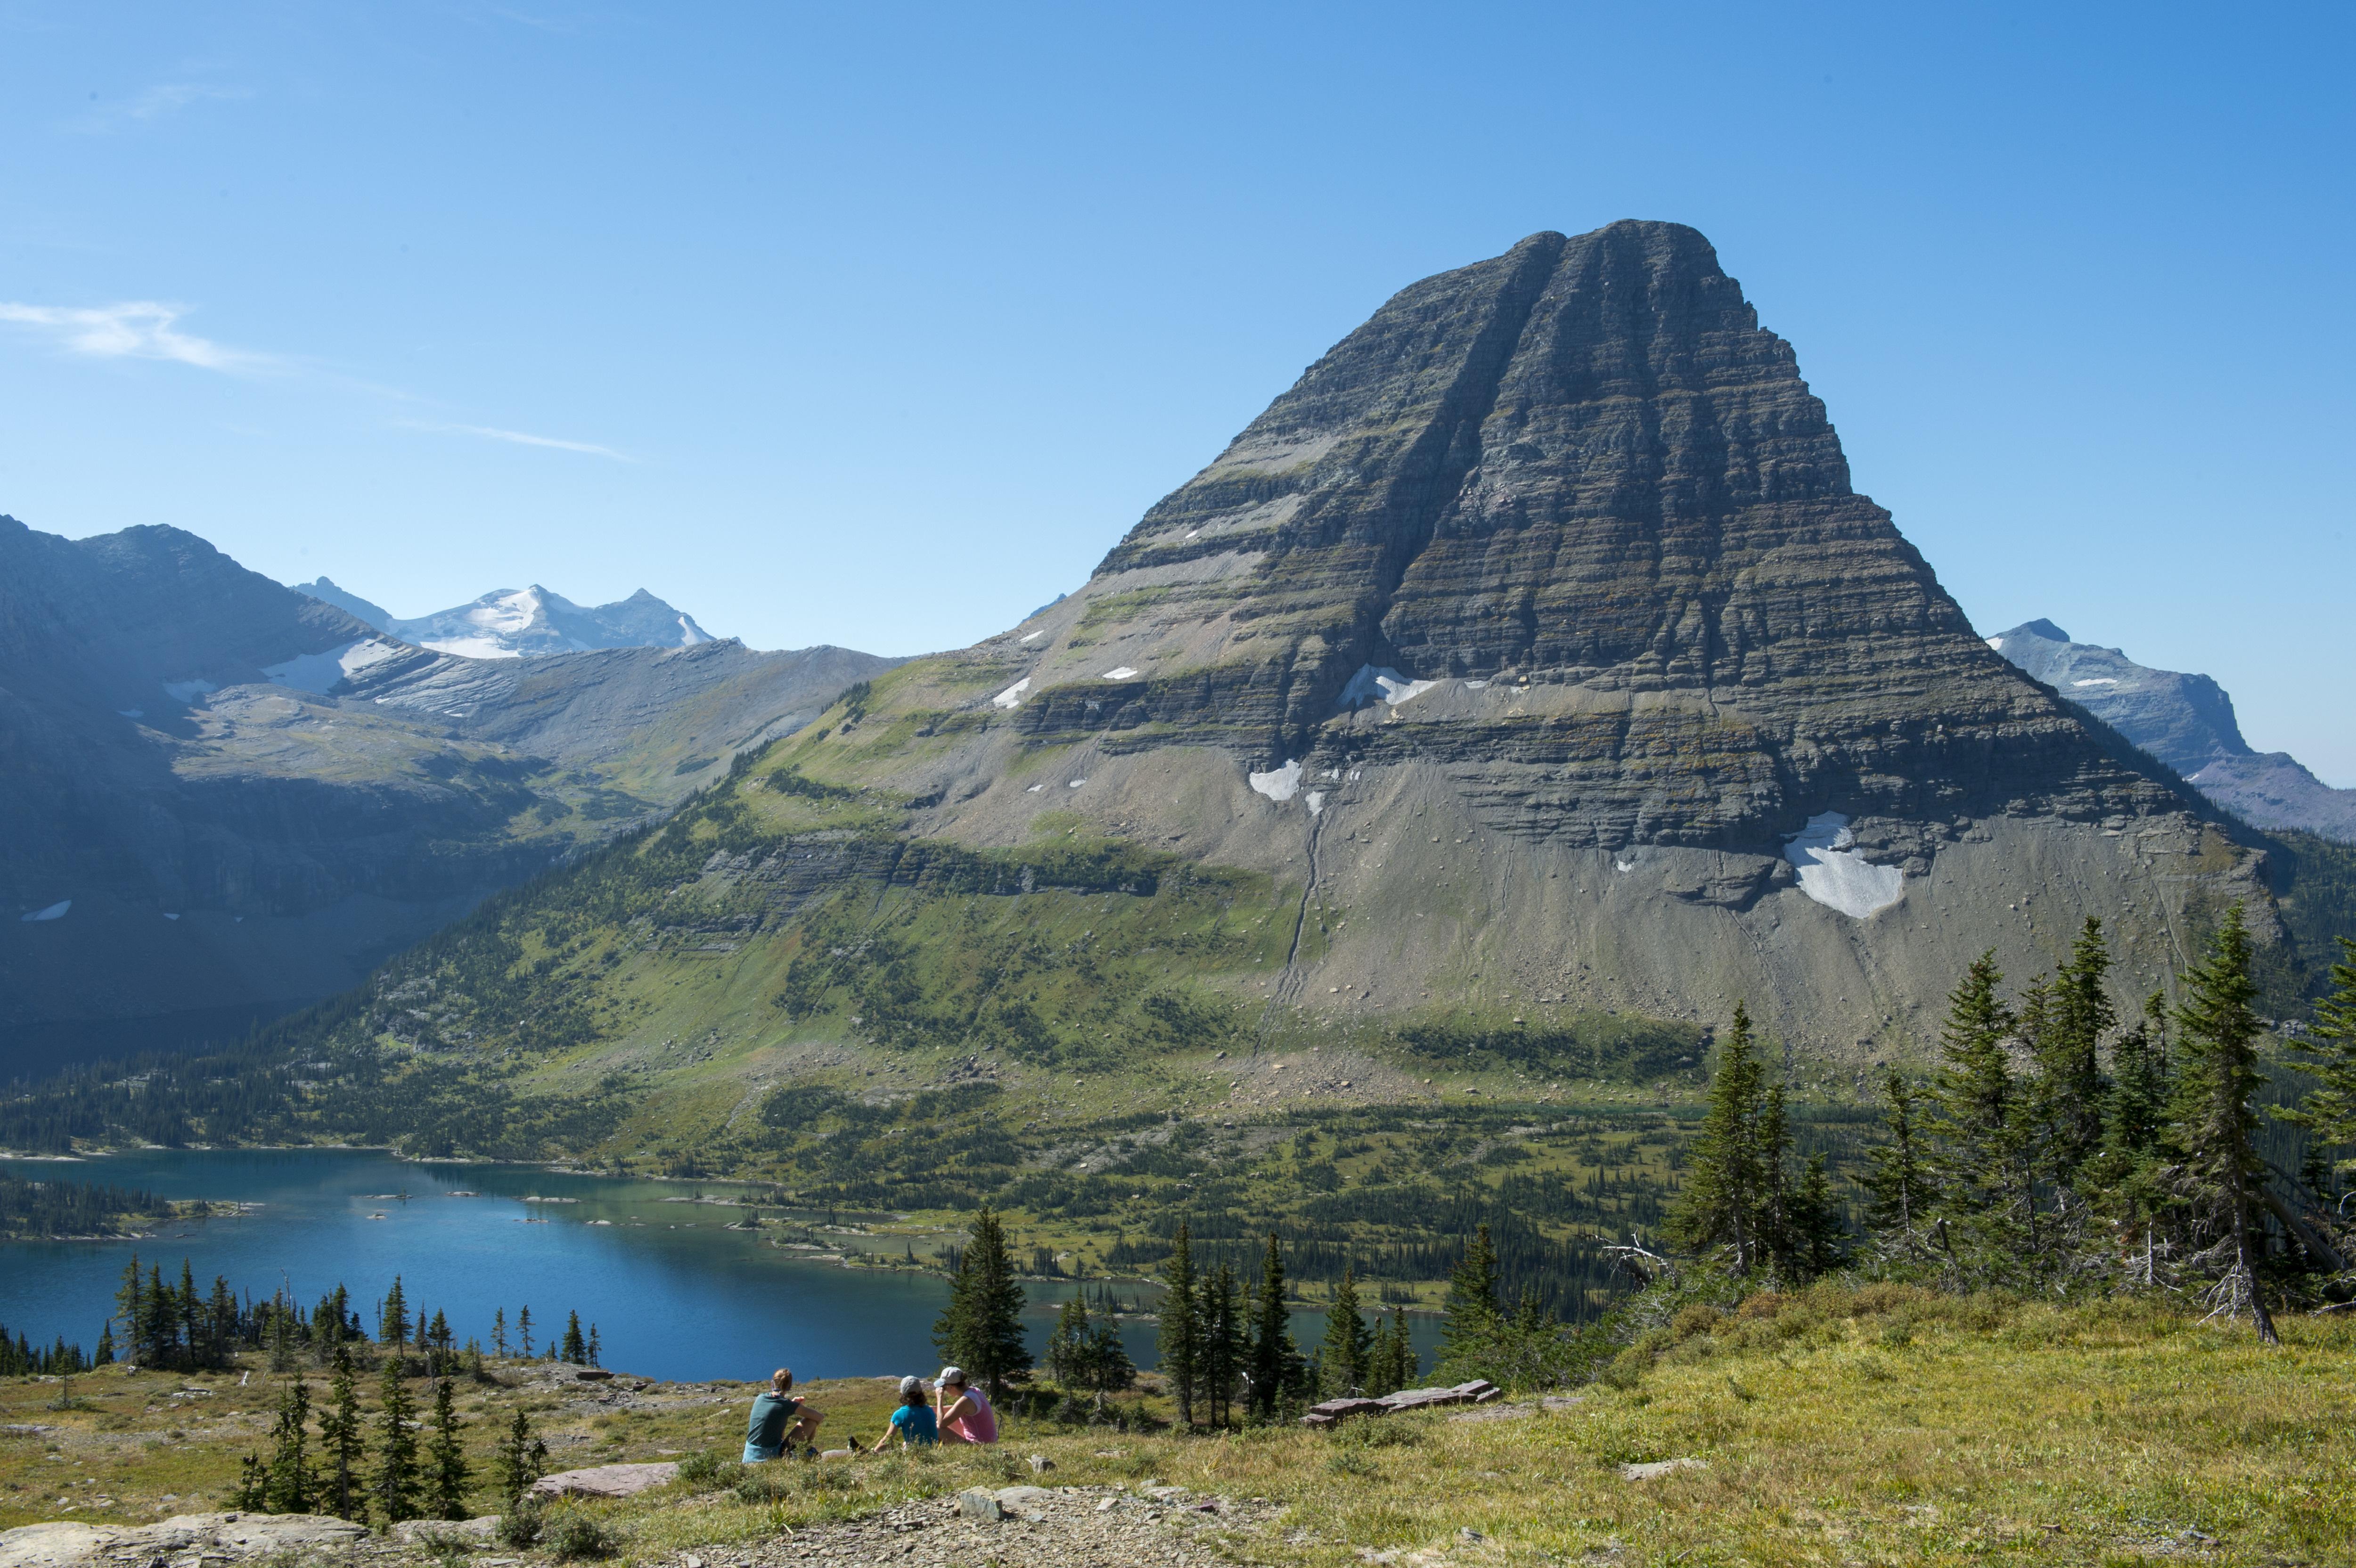 View of Bearhat Mountain above Hidden Lake at Logan Pass in